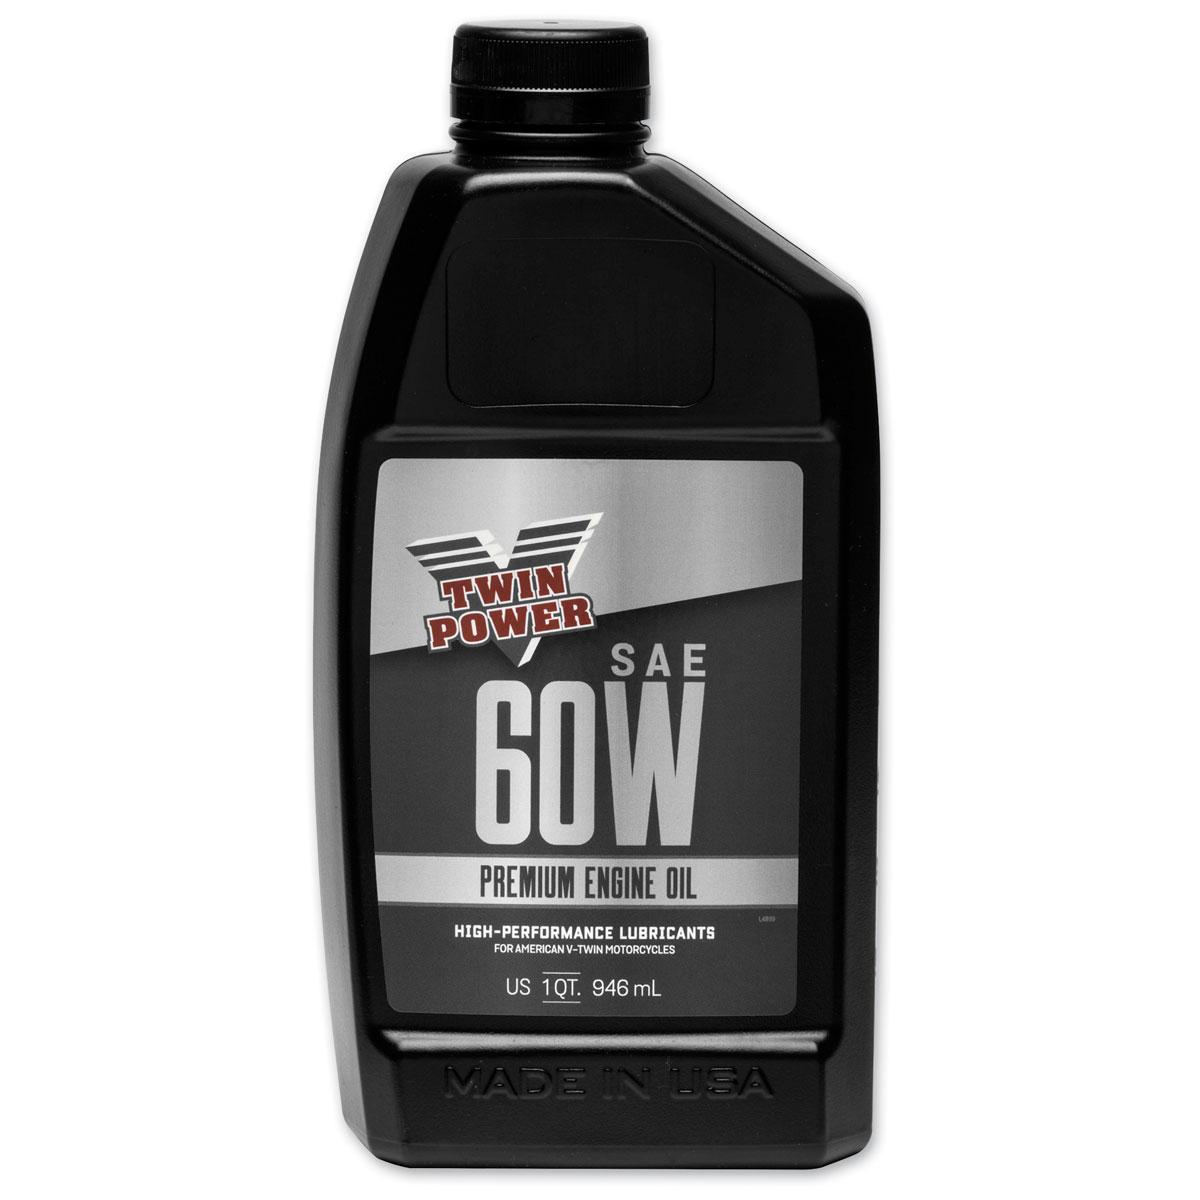 Twin Power Premium 60W Engine Oil Quart